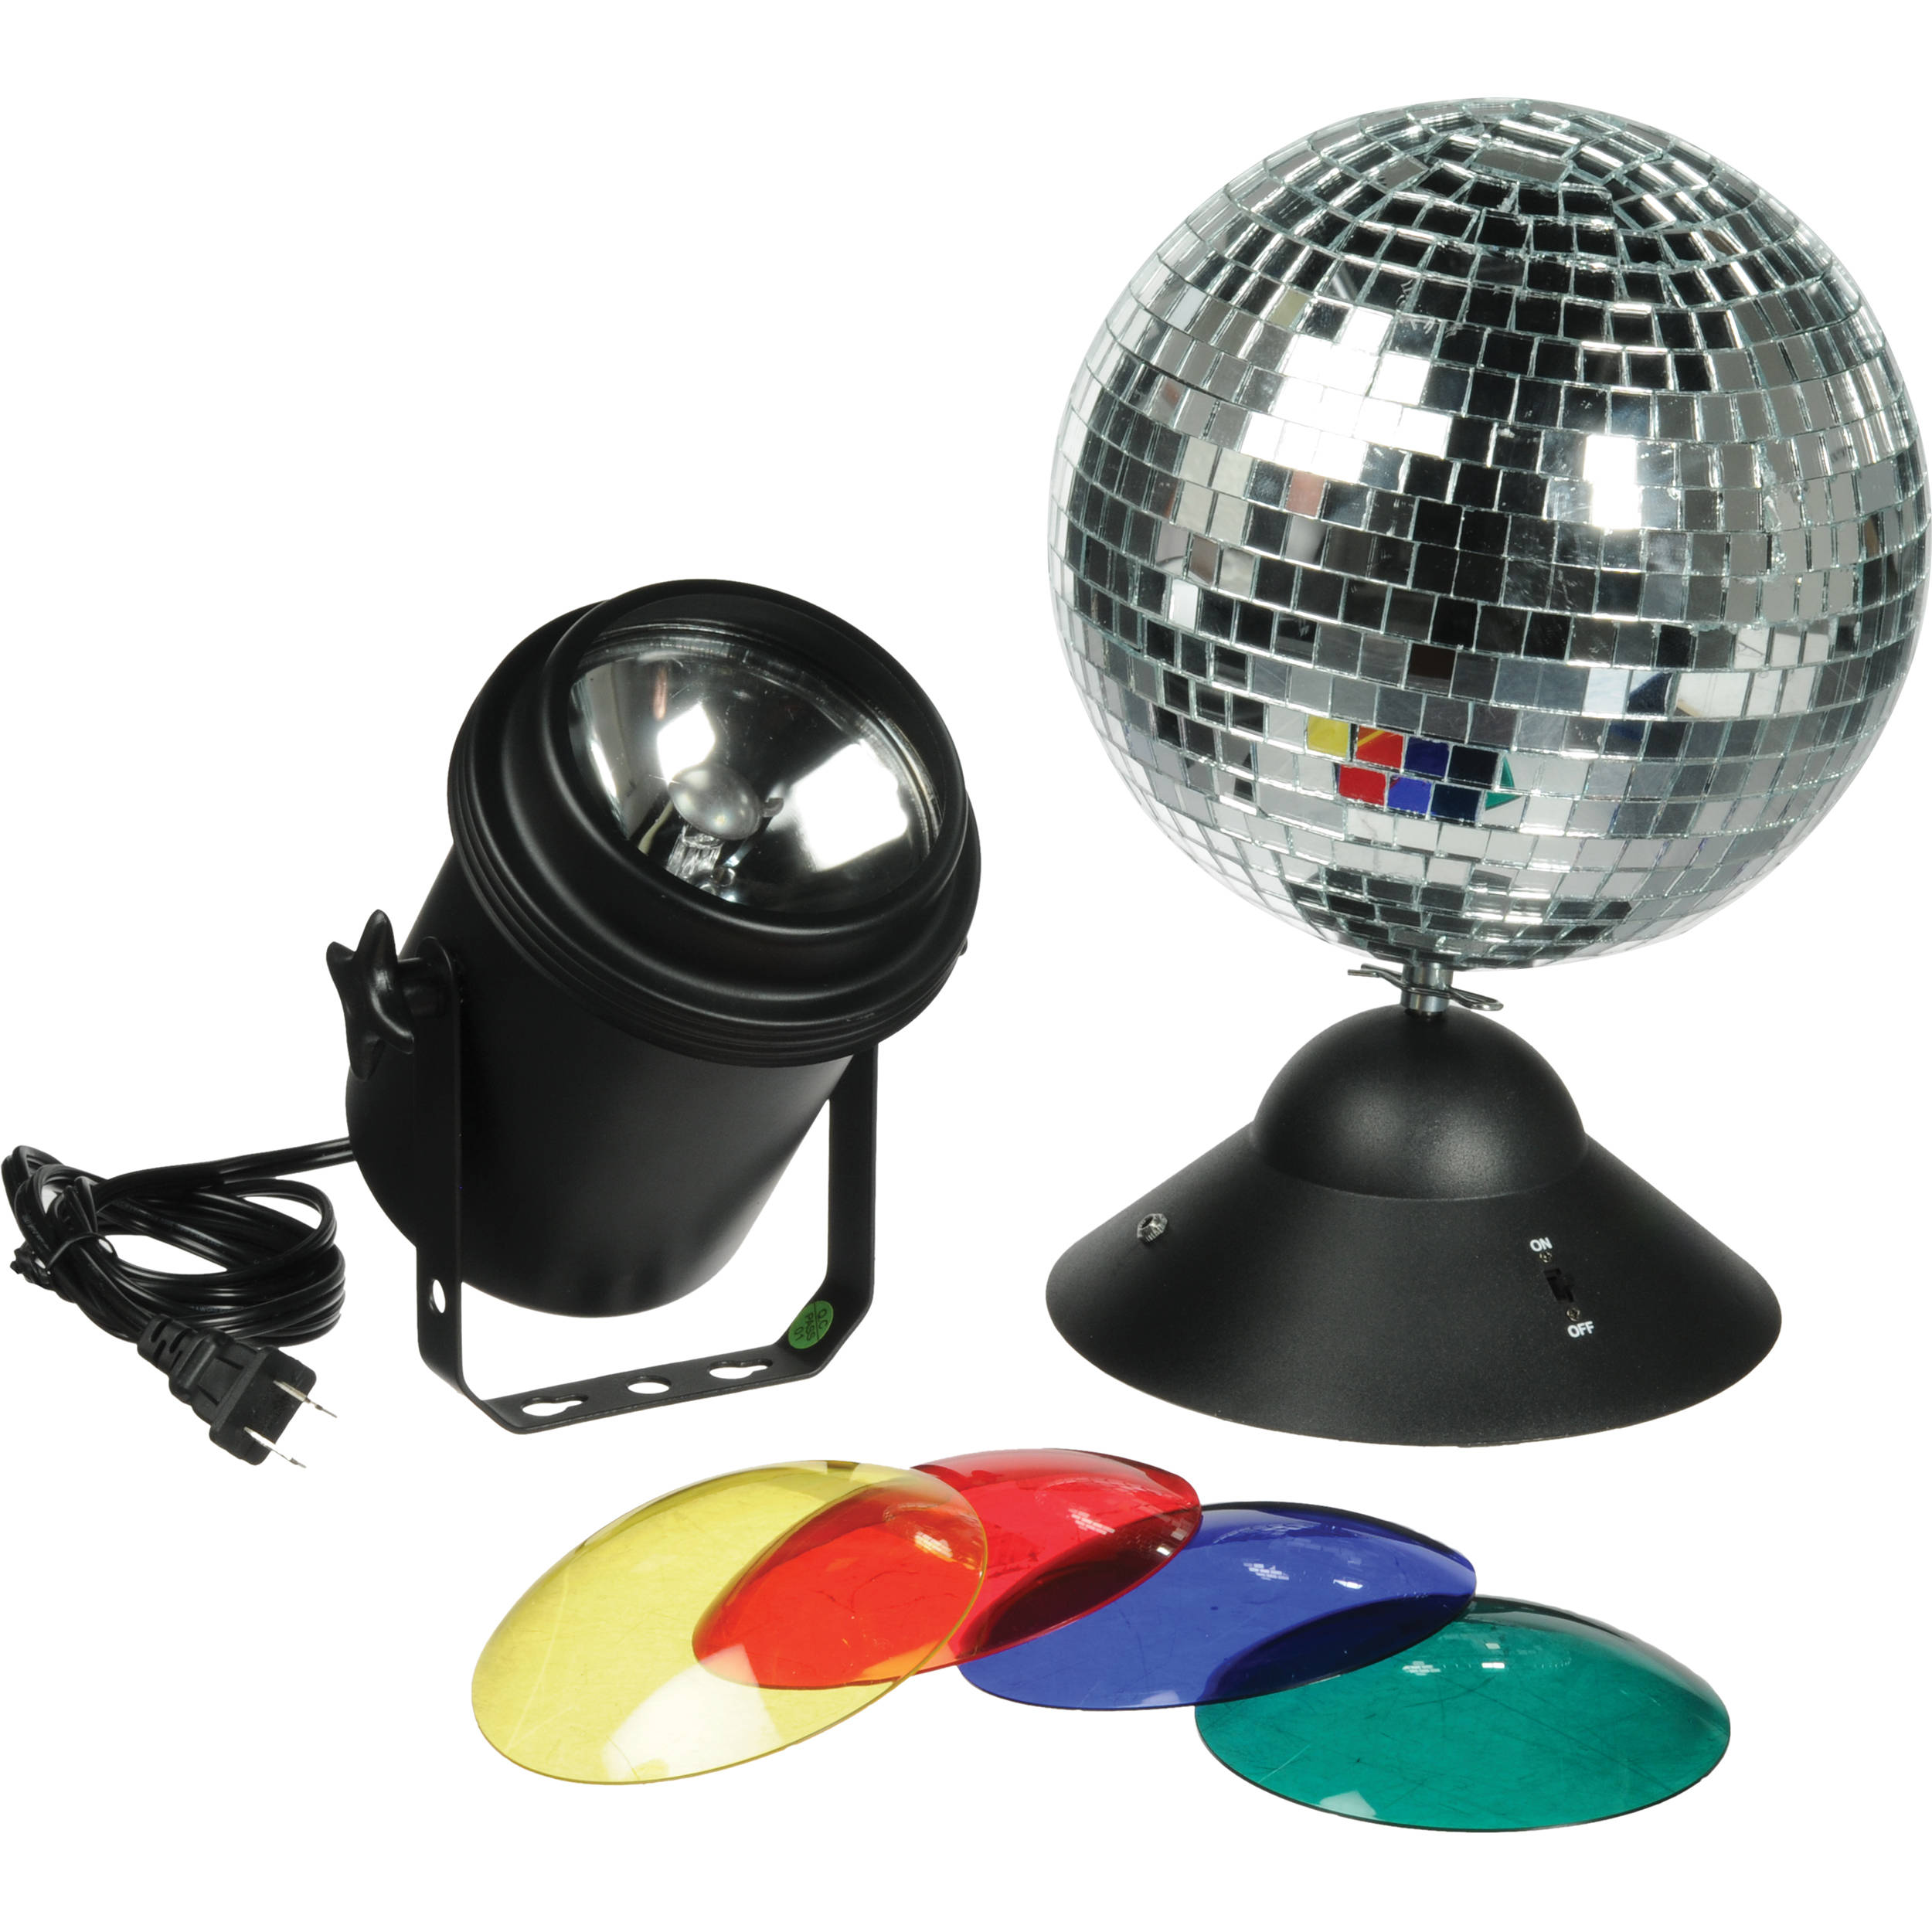 american light system stage effects lilianduval lighting usb alt chauvet flex dj t